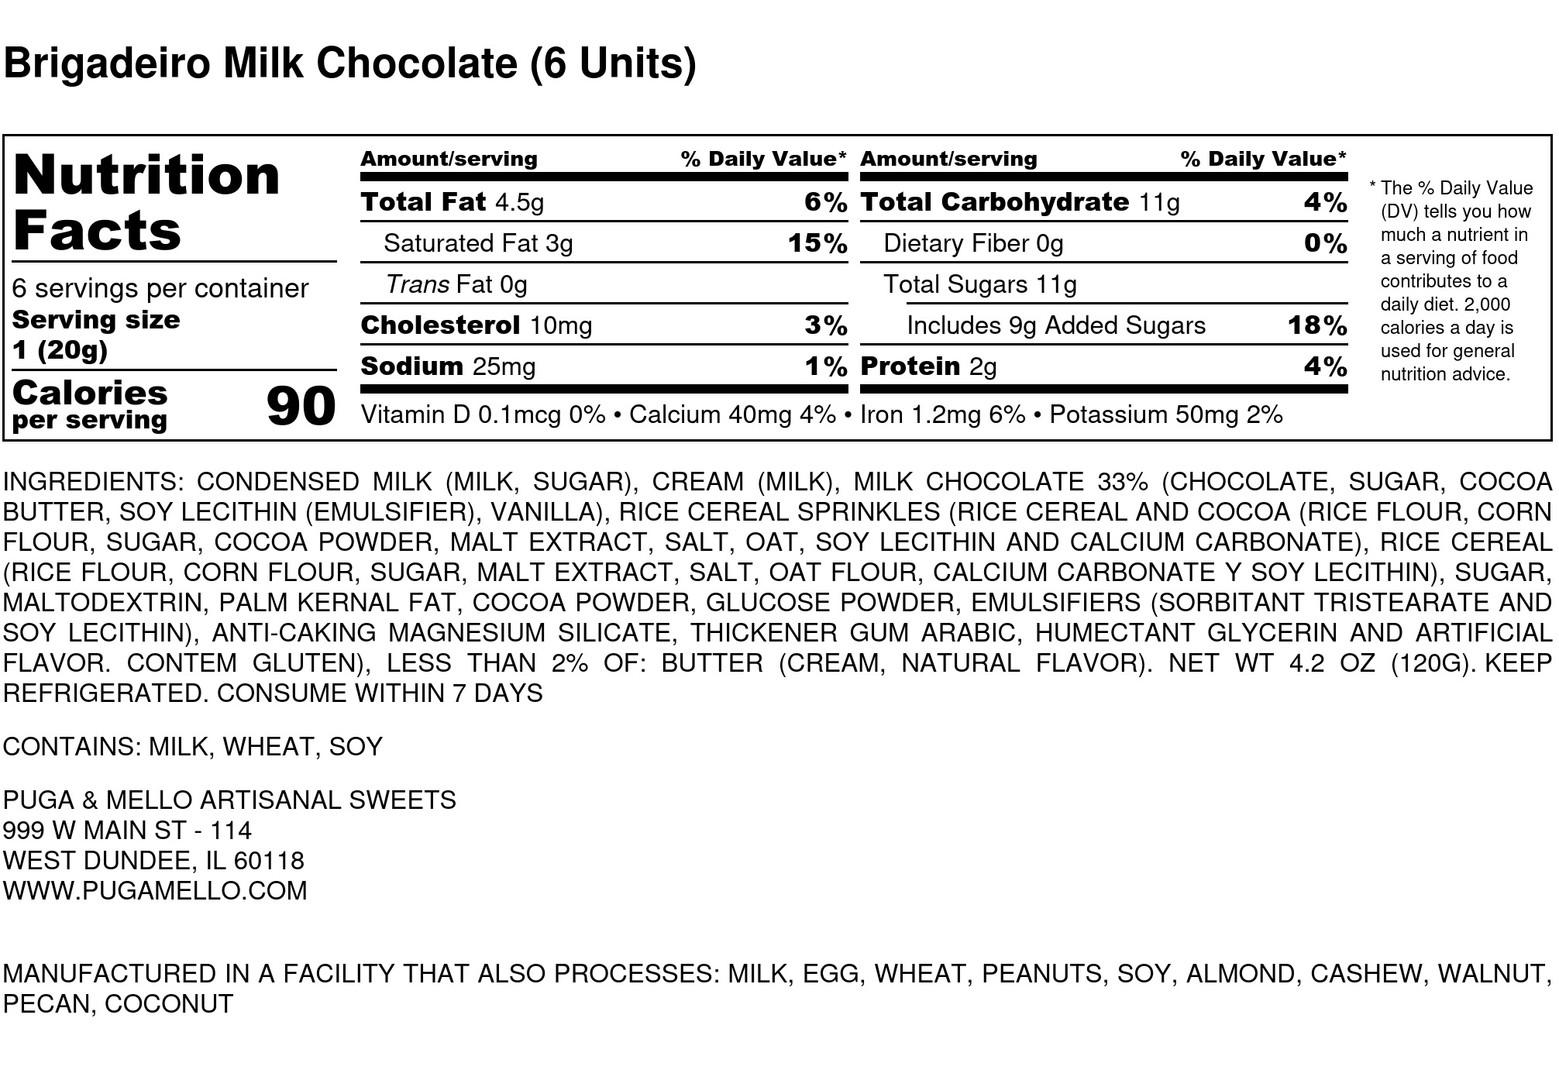 Brigadeiro Milk Chocolate (6 Units) - Nu